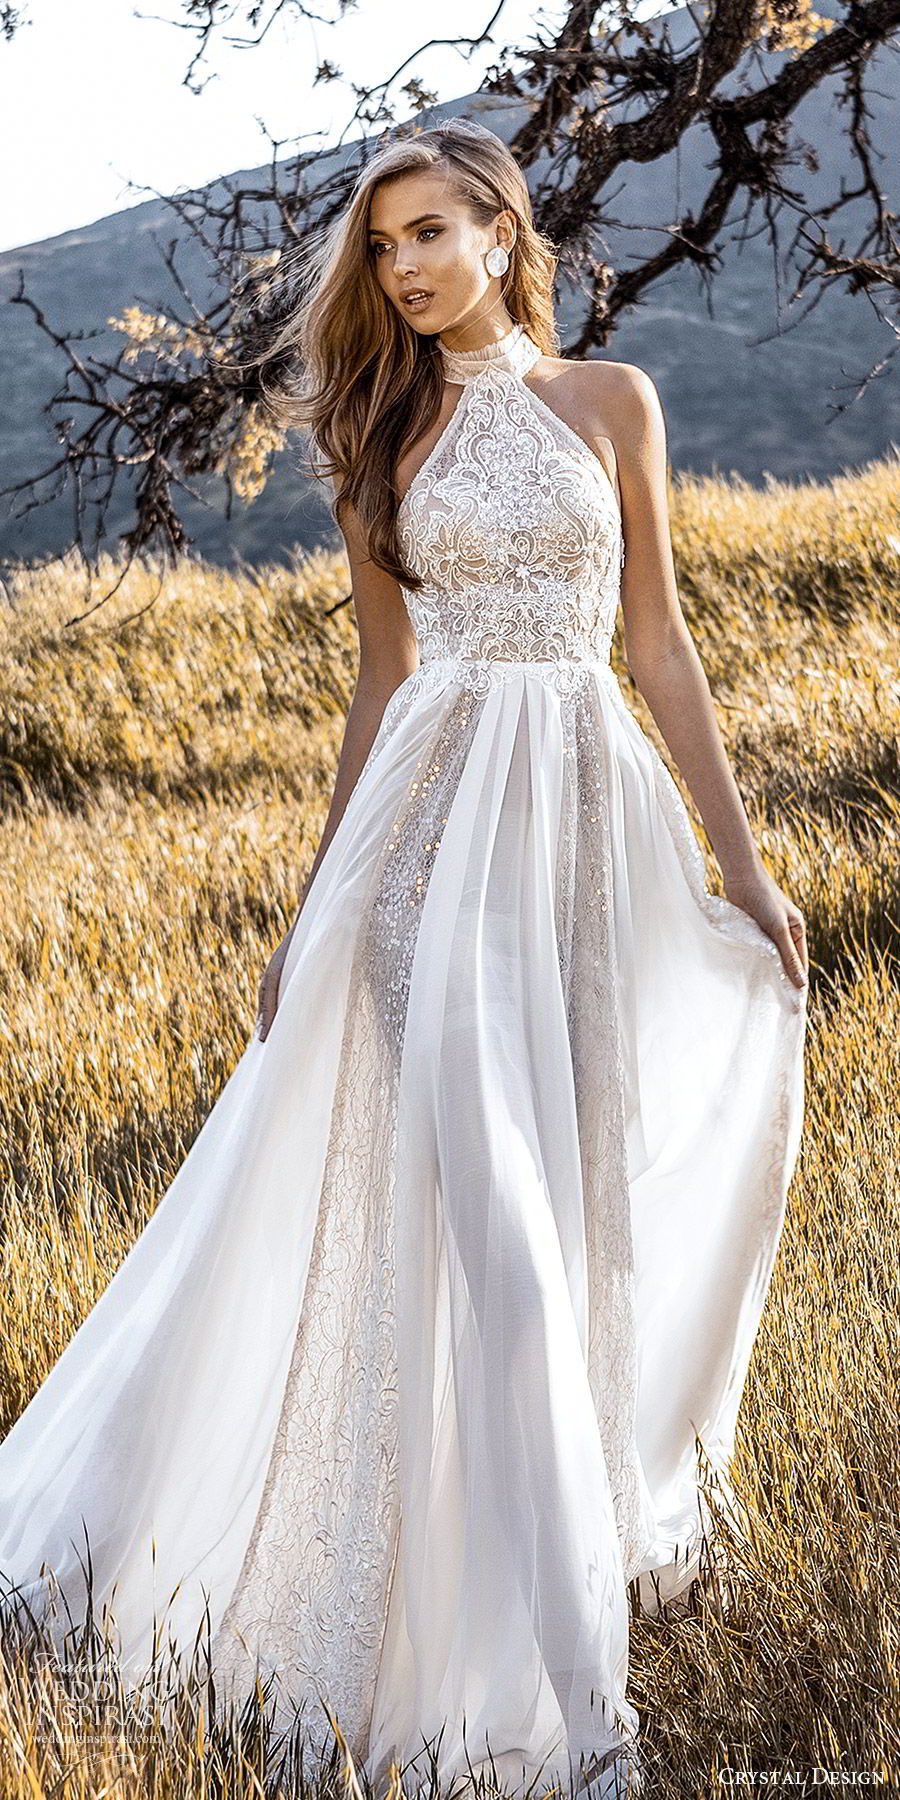 crystal design 2020 couture bridal sleeveless halter neckline fully embellished sheath wedding dress a line ball gown overskirt (1) romantic glitzy chapel train mv